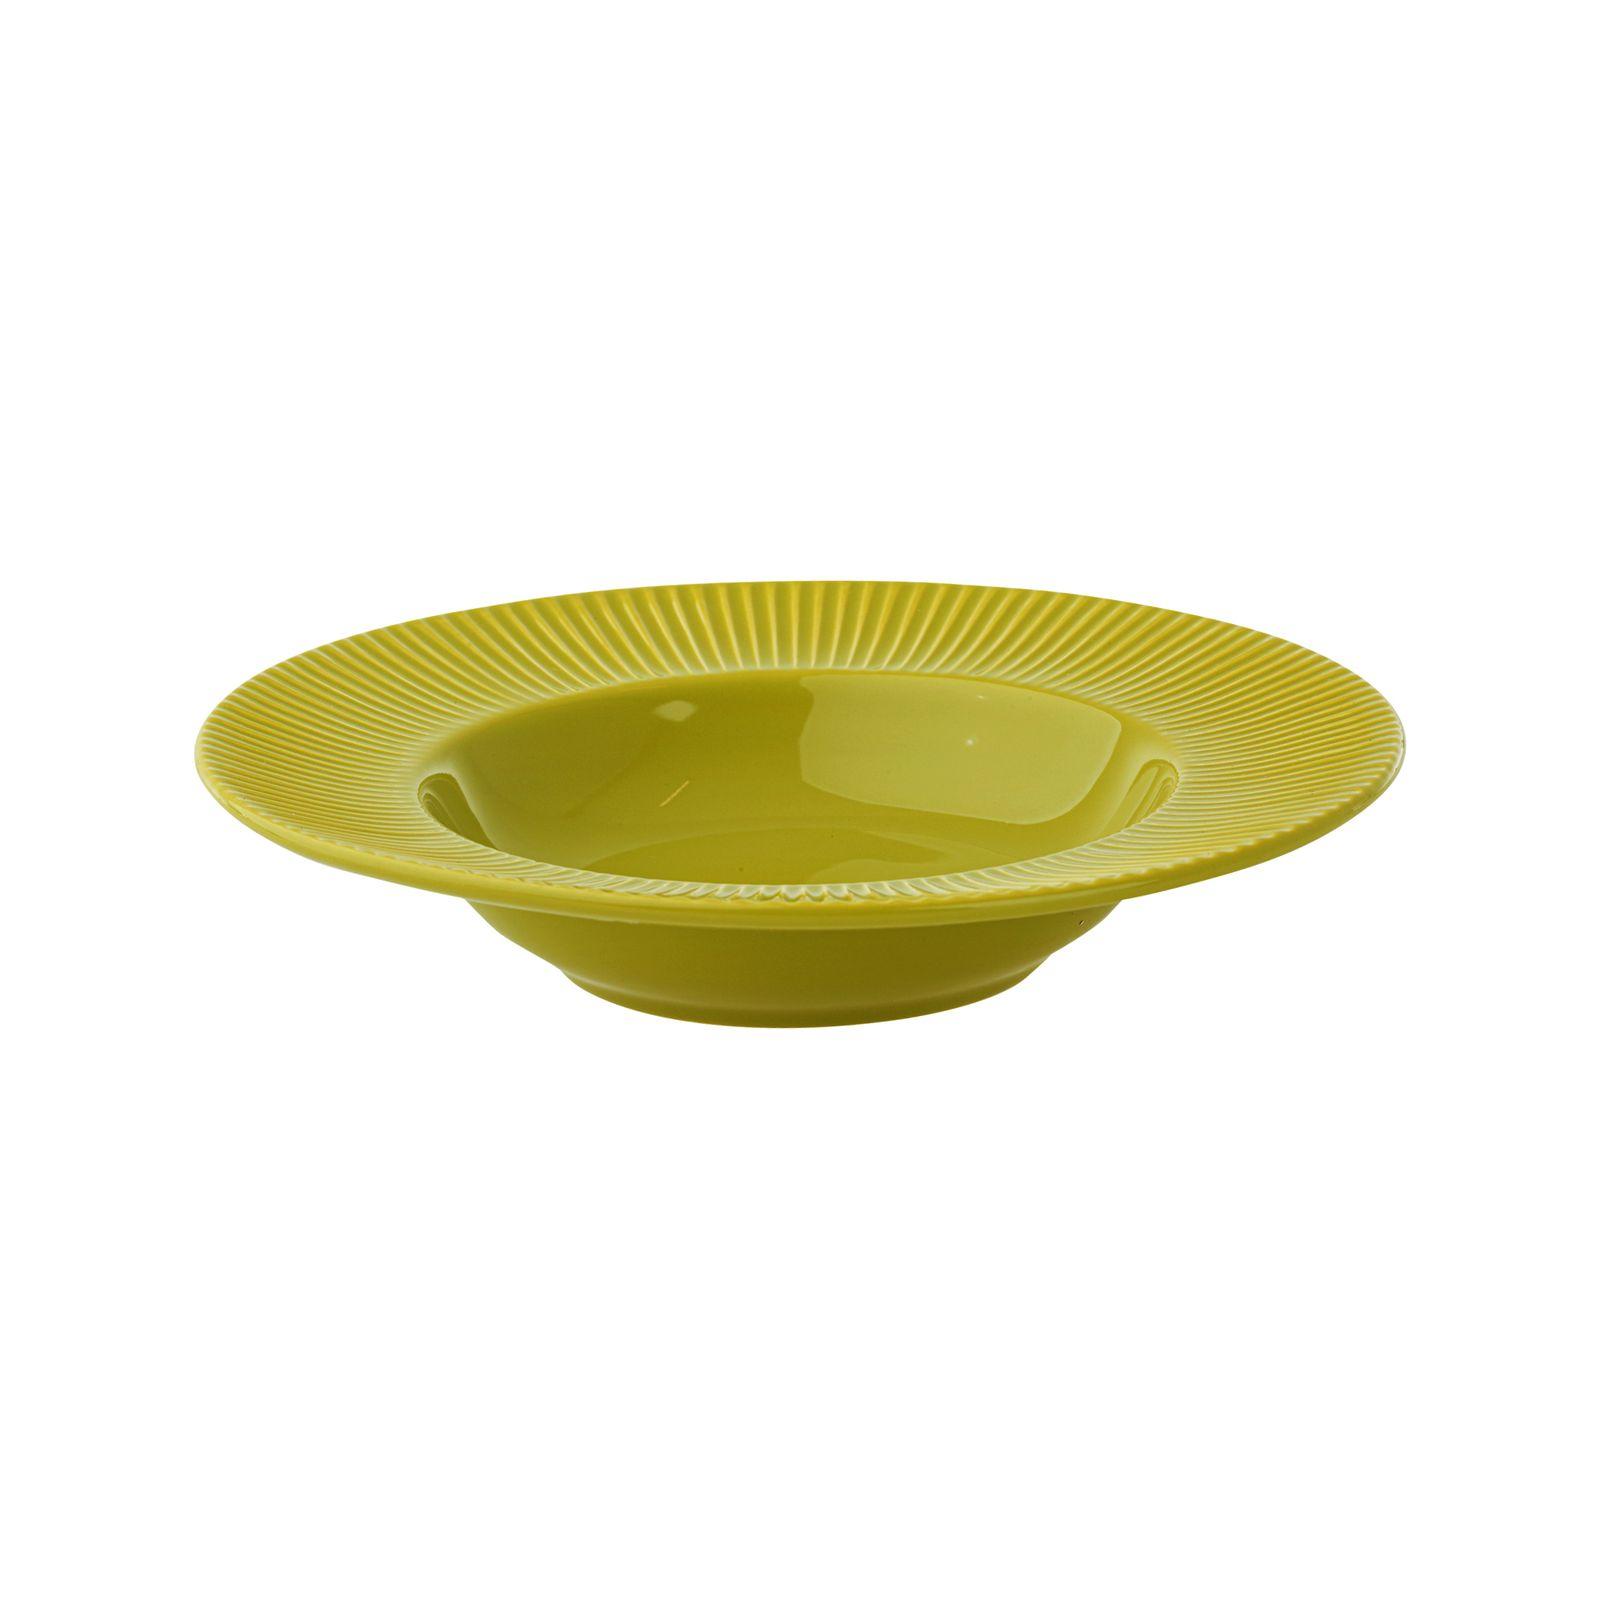 Soup plate Palette 24 cm AMBITION Lime green